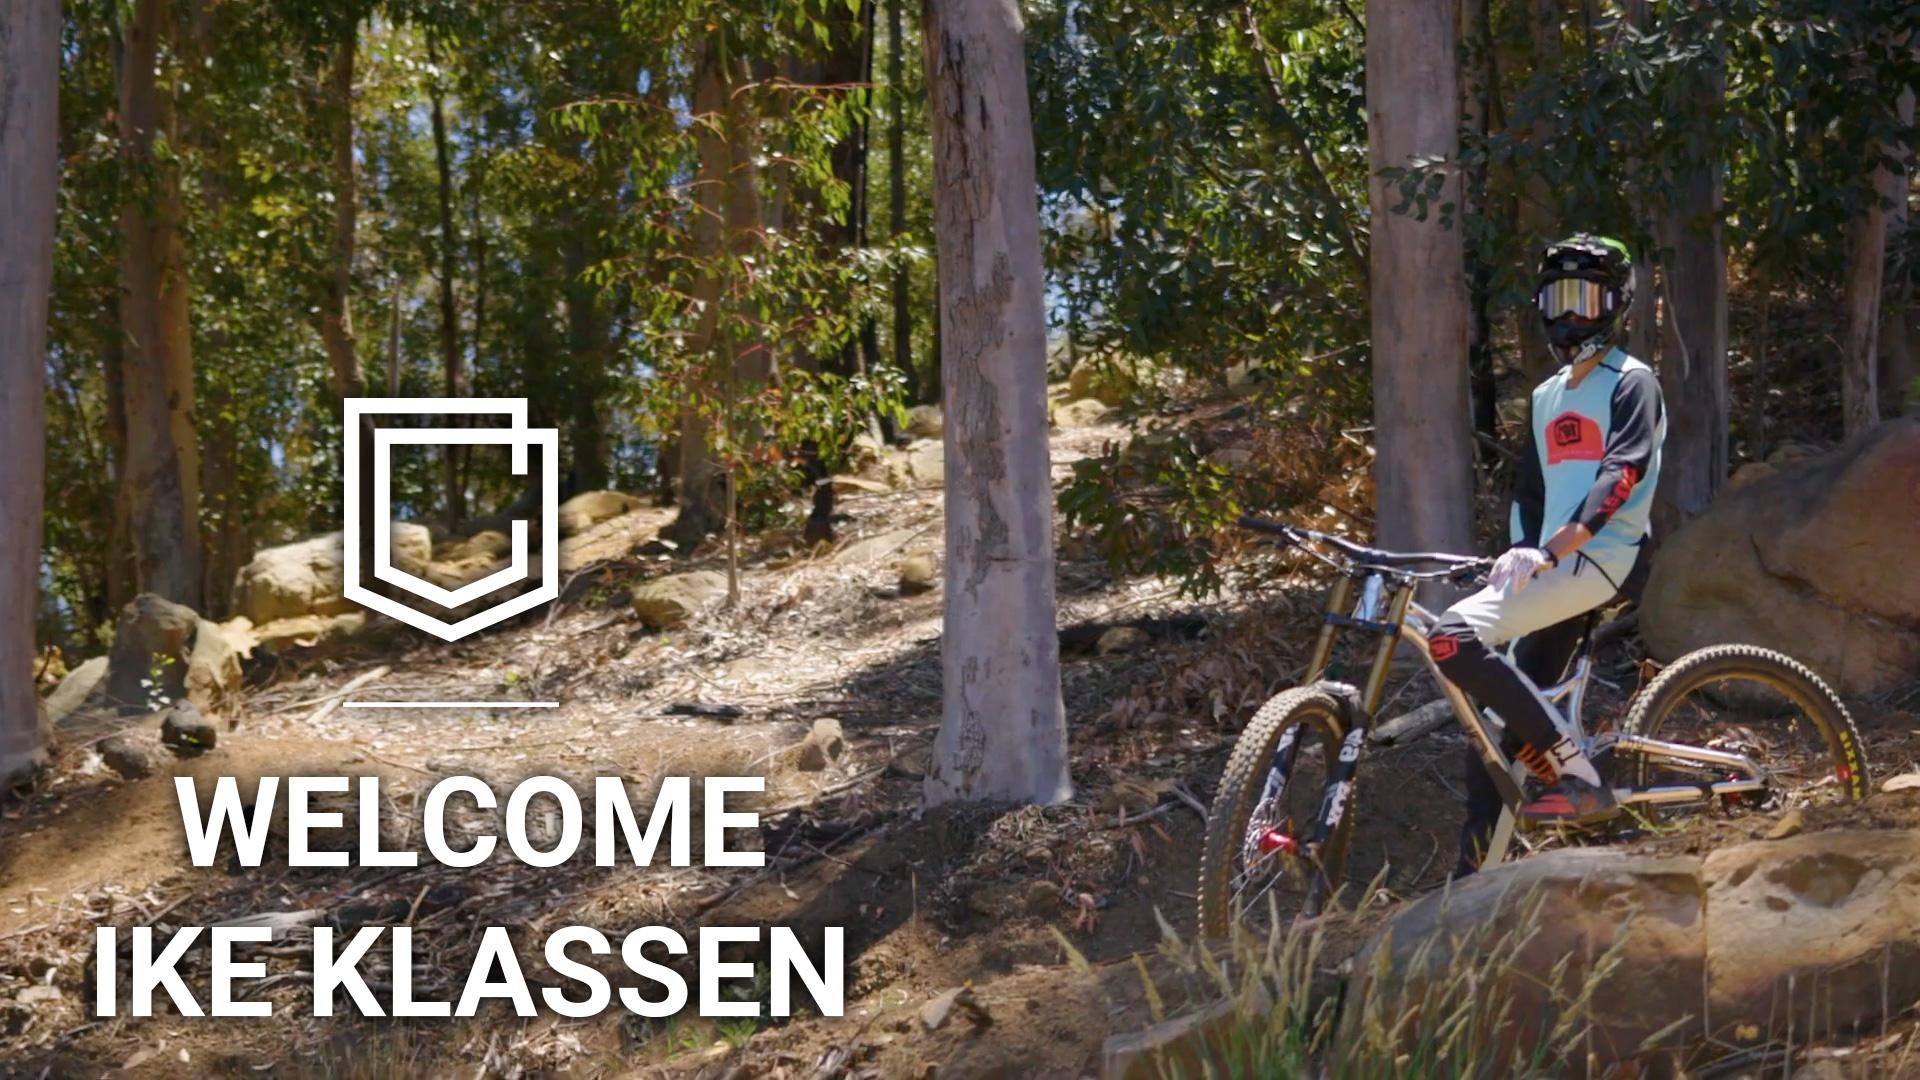 , Ike Klaassen Join Commencal South Africa